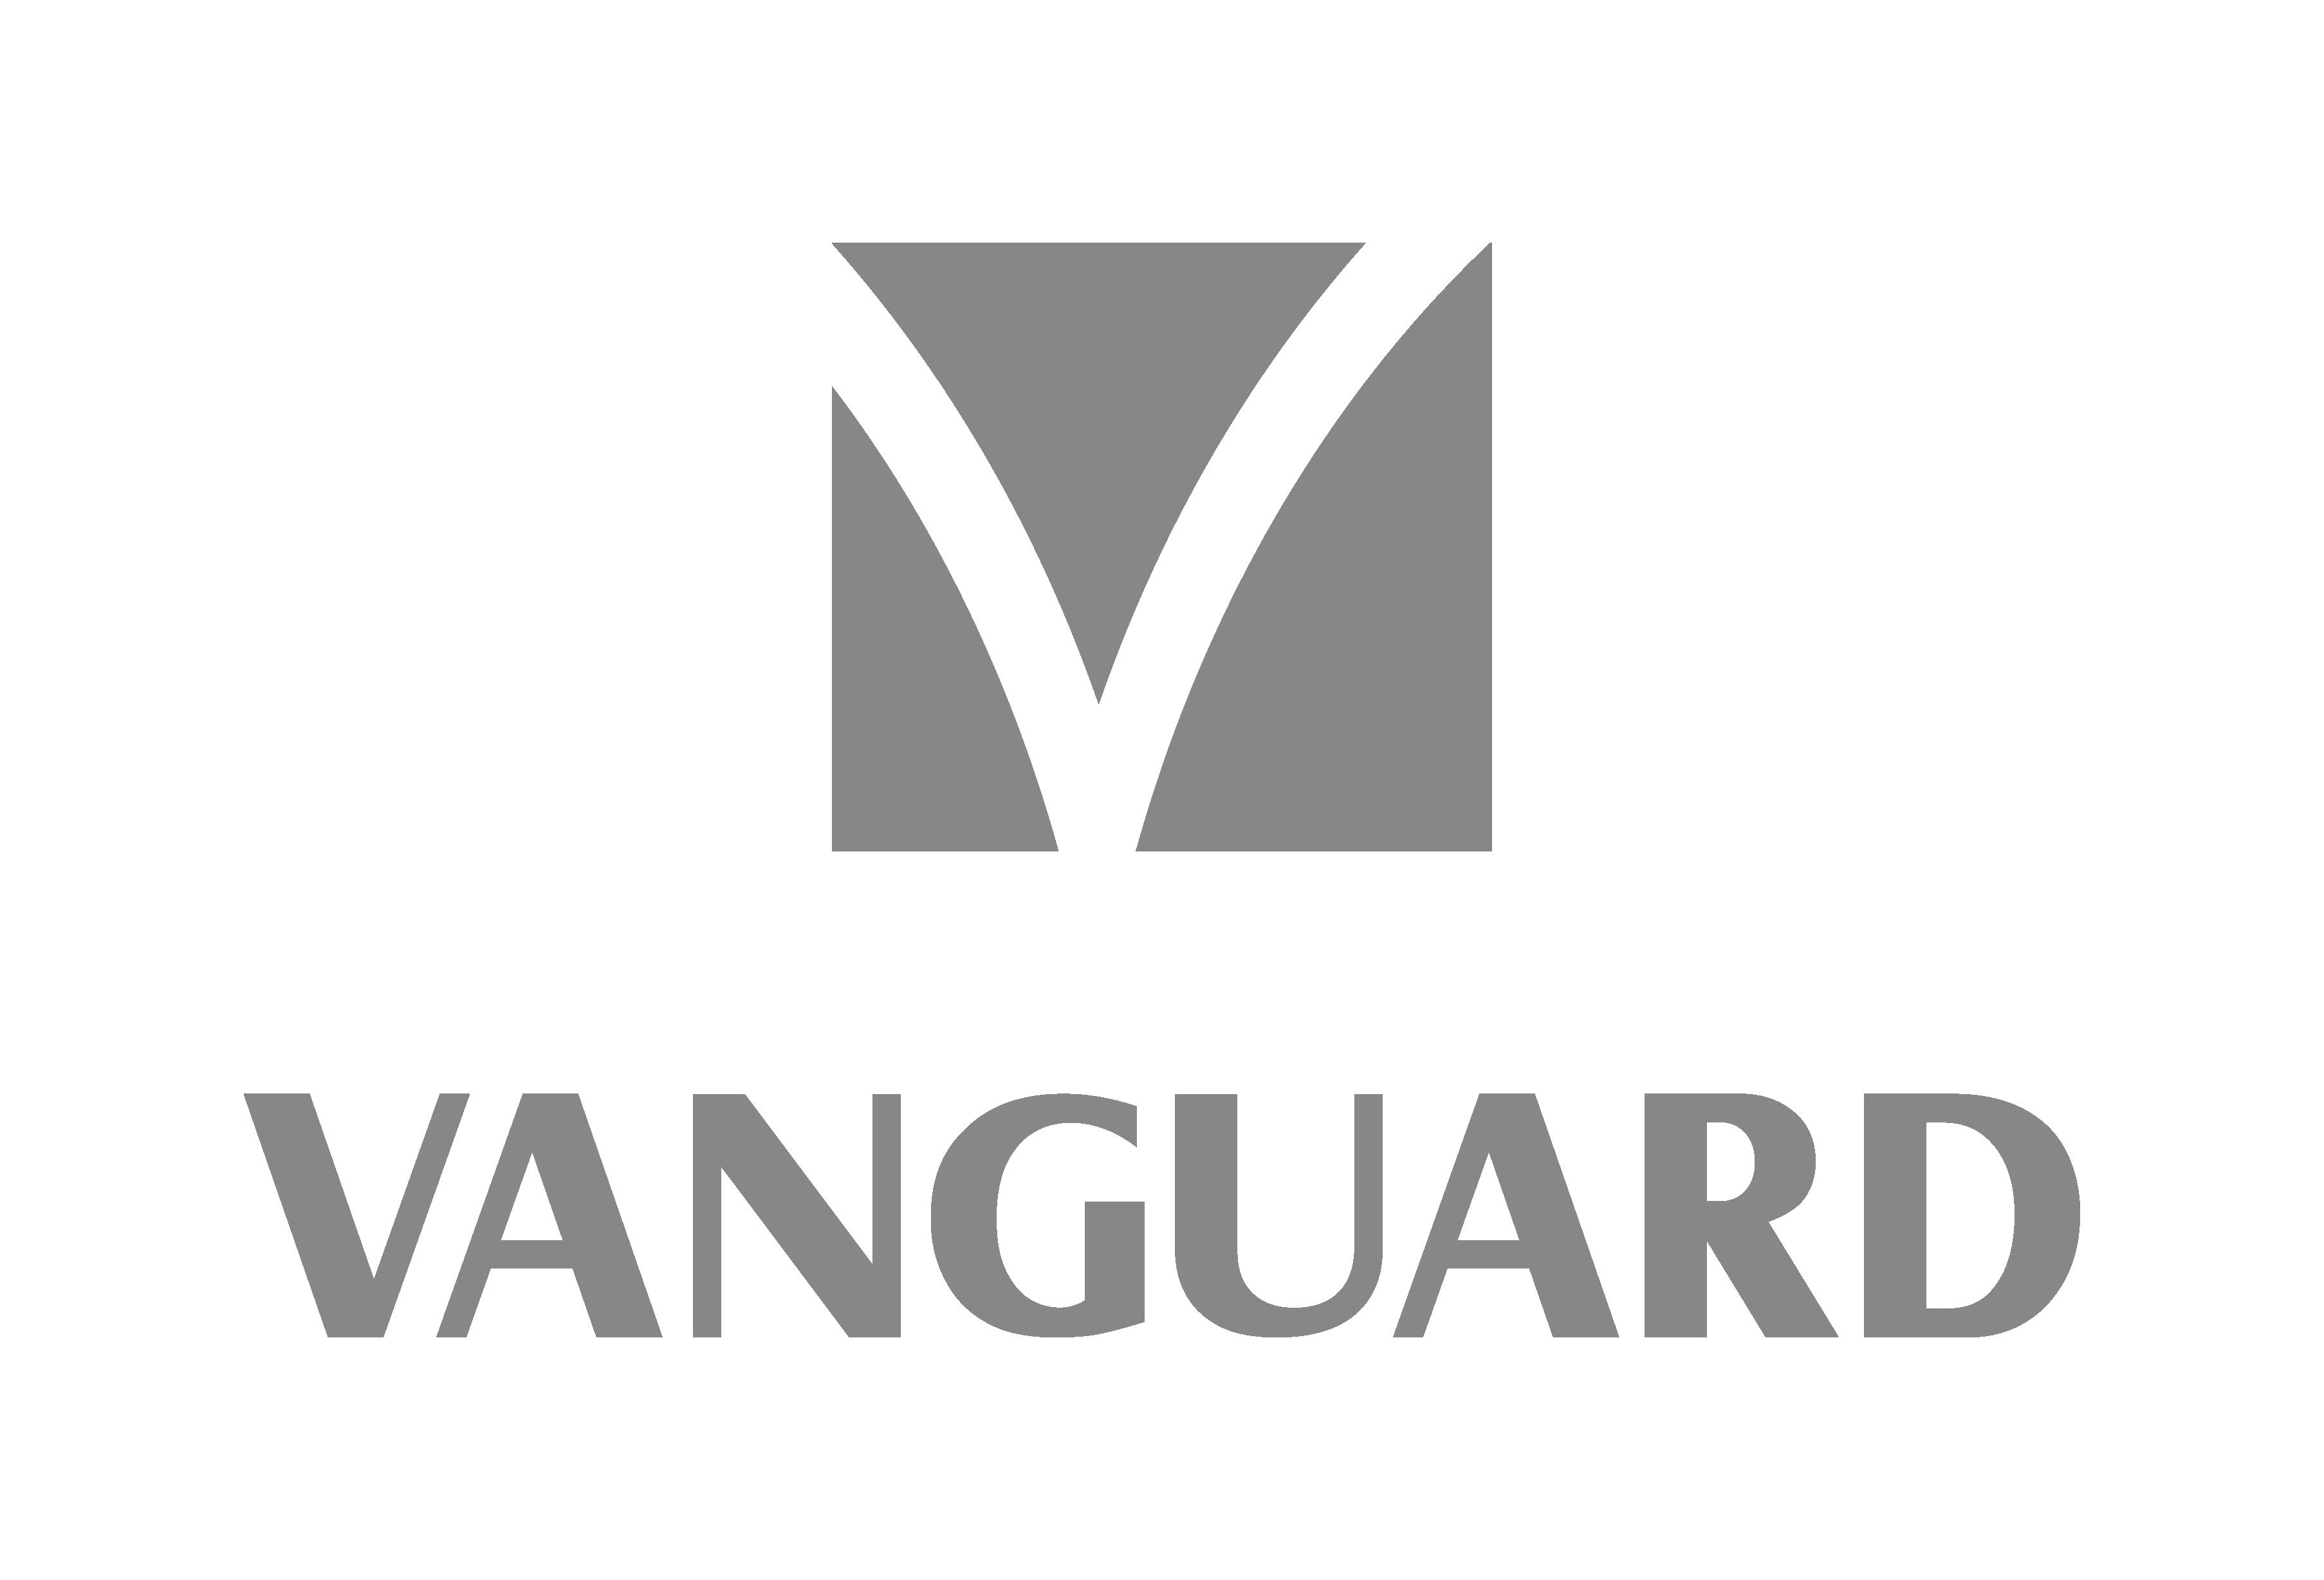 Vanguard-LogotipoSimbolo-Vetical-Monocromatico-FundoClaro